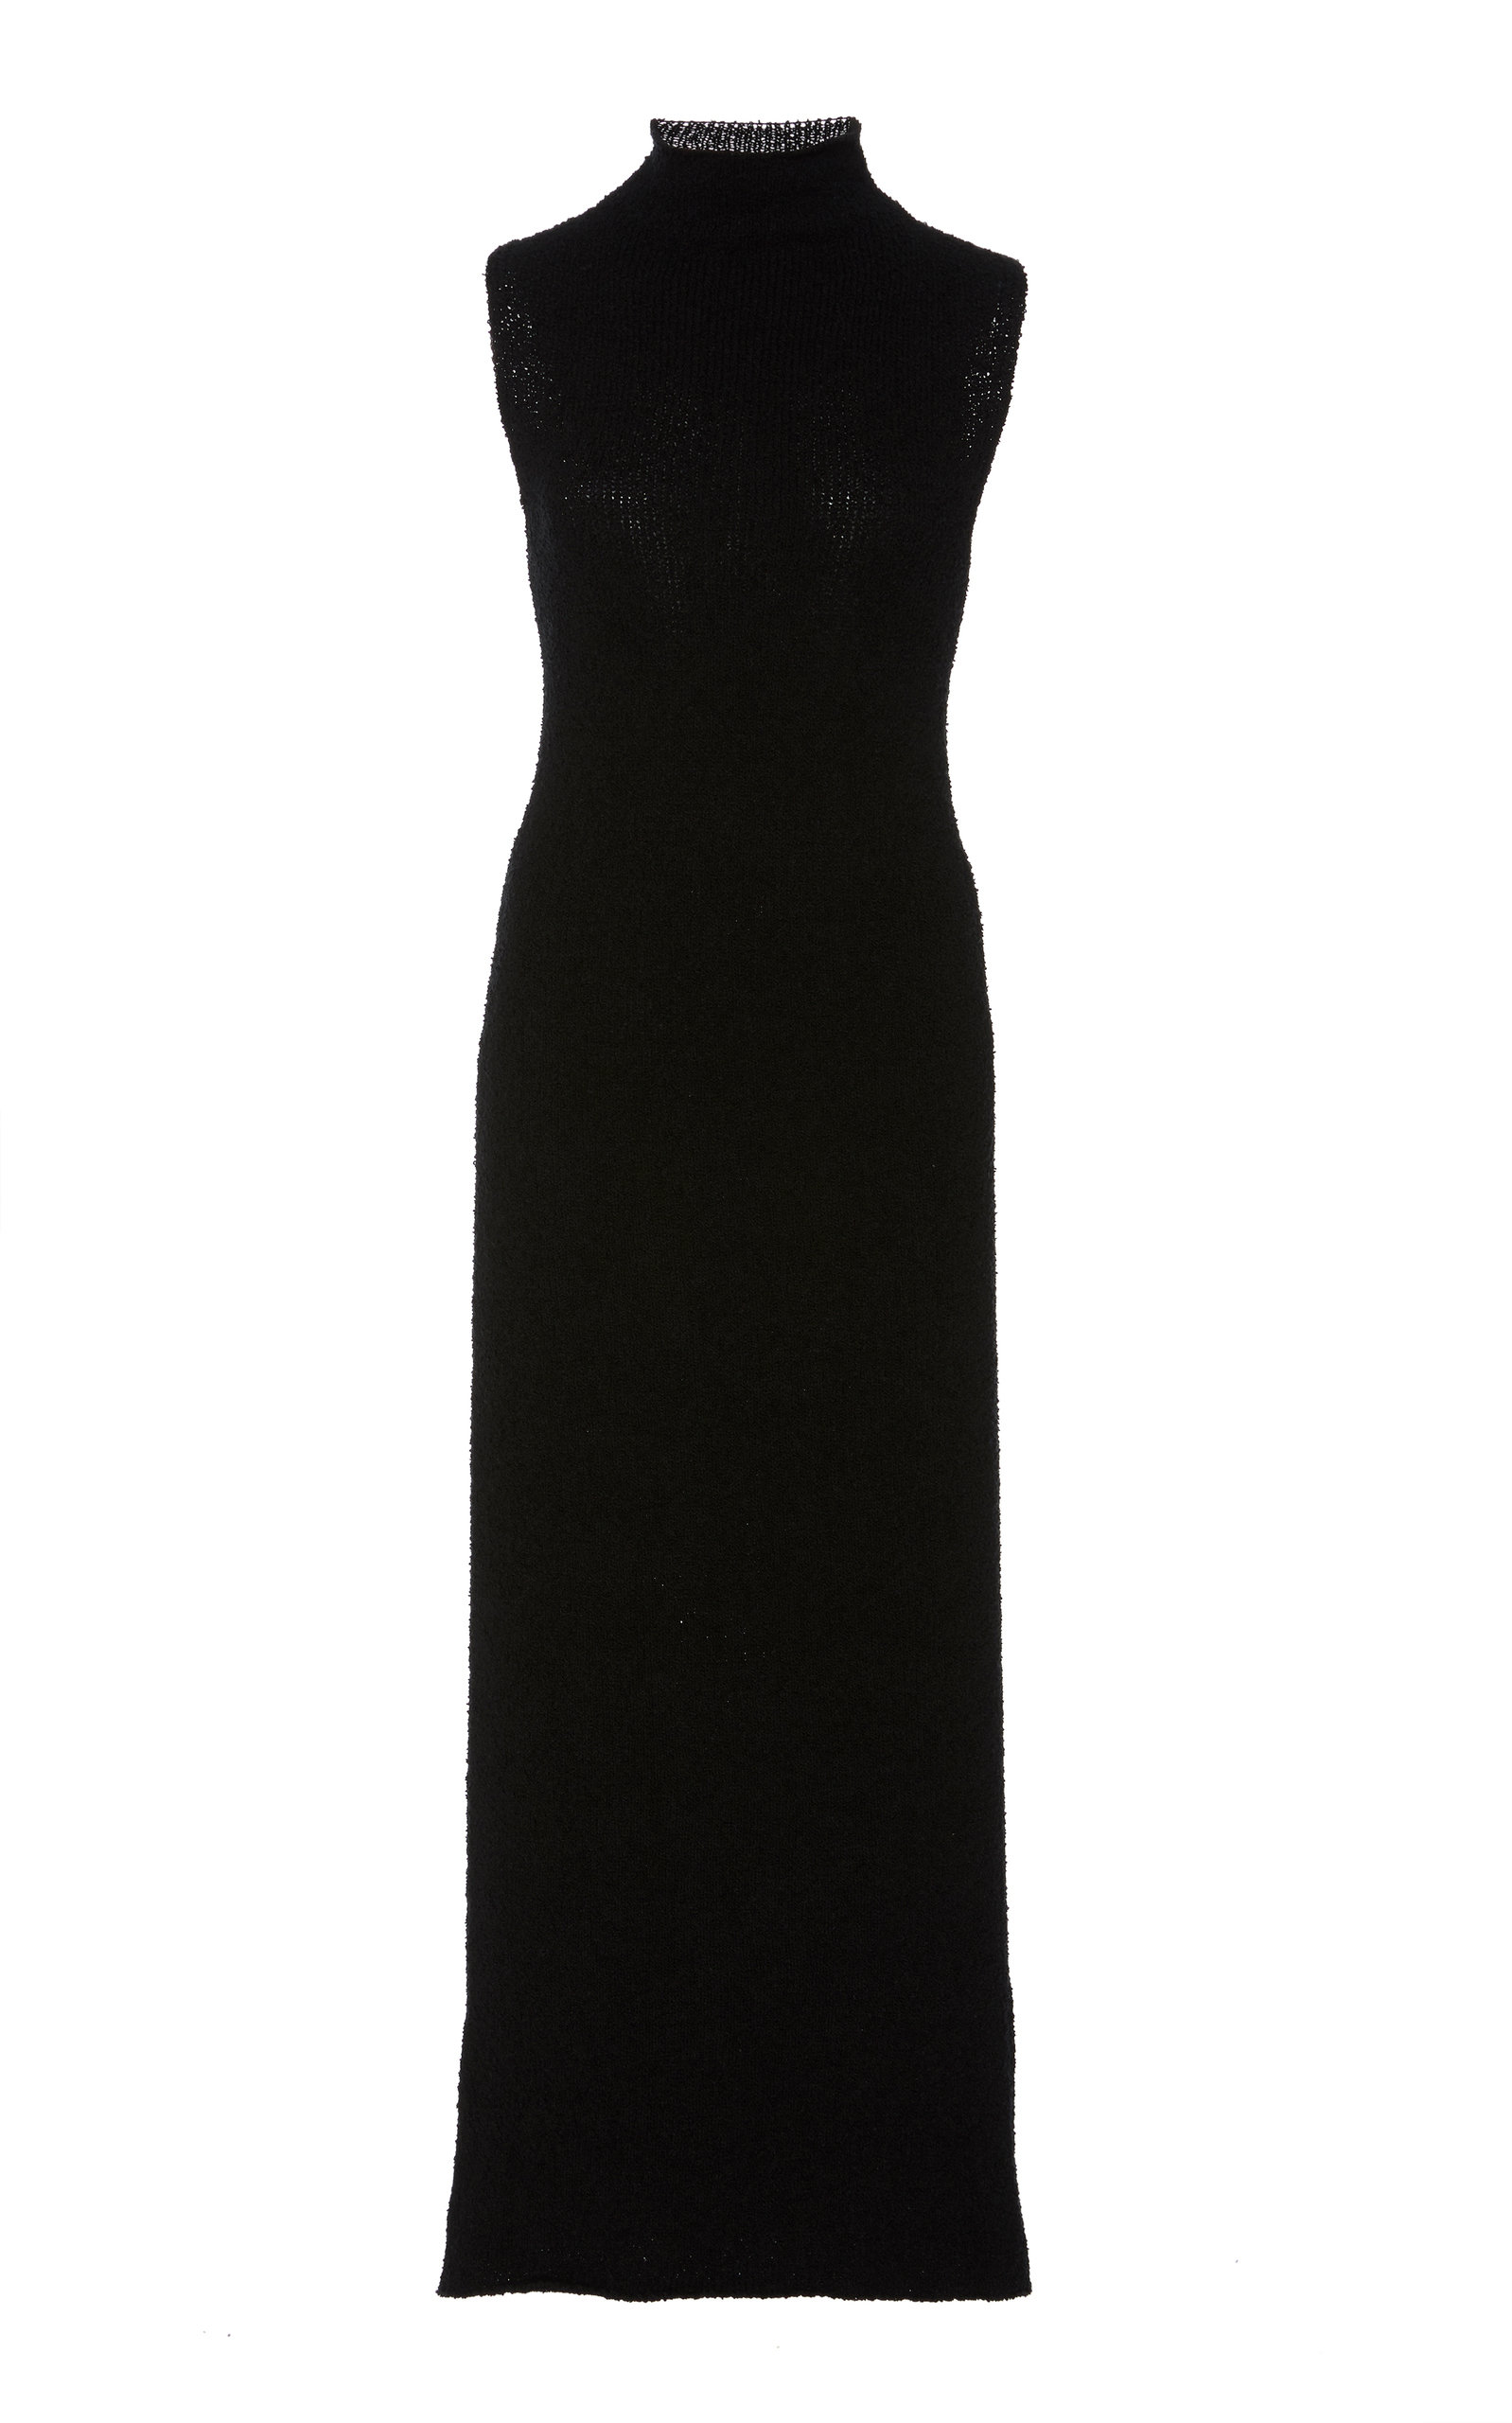 Buy Mara Hoffman Rory Modal-Blend Turtleneck Midi Dress online, shop Mara Hoffman at the best price